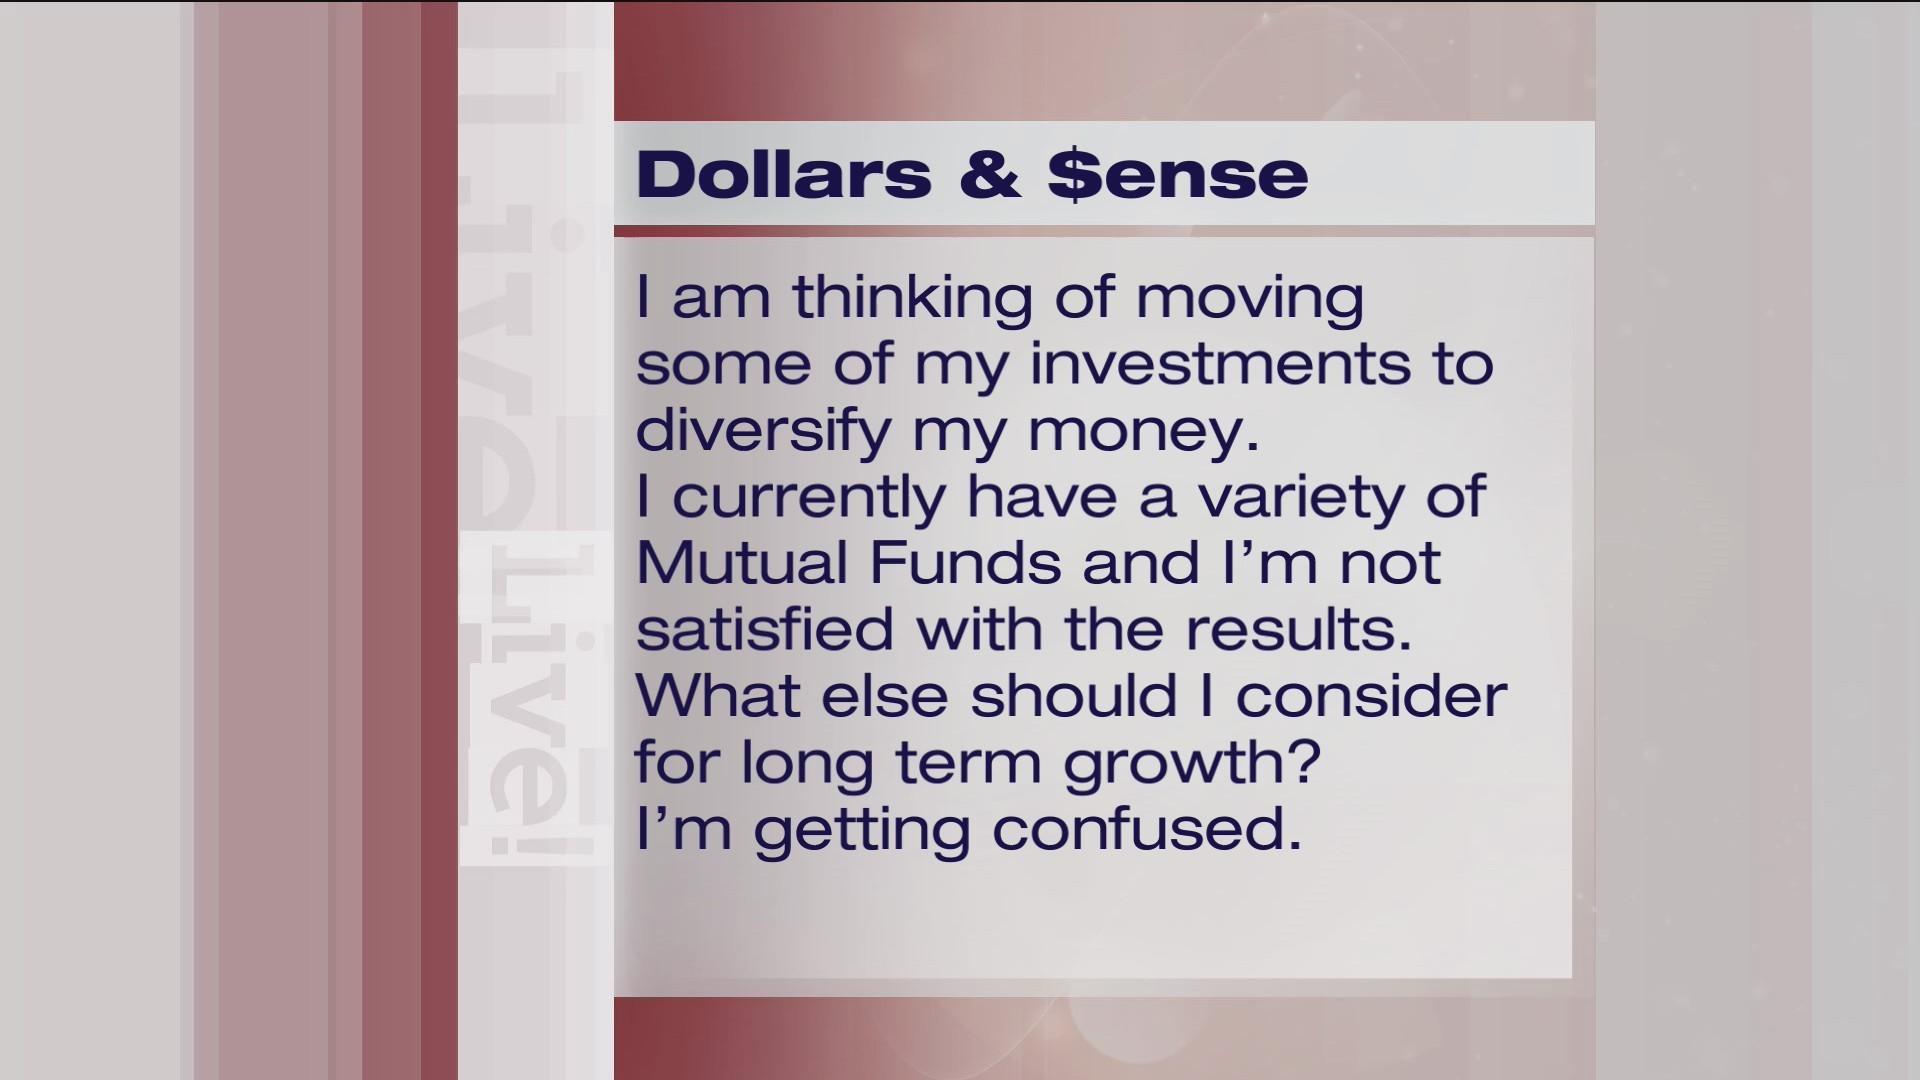 Dollars & Sense - 4/23/19